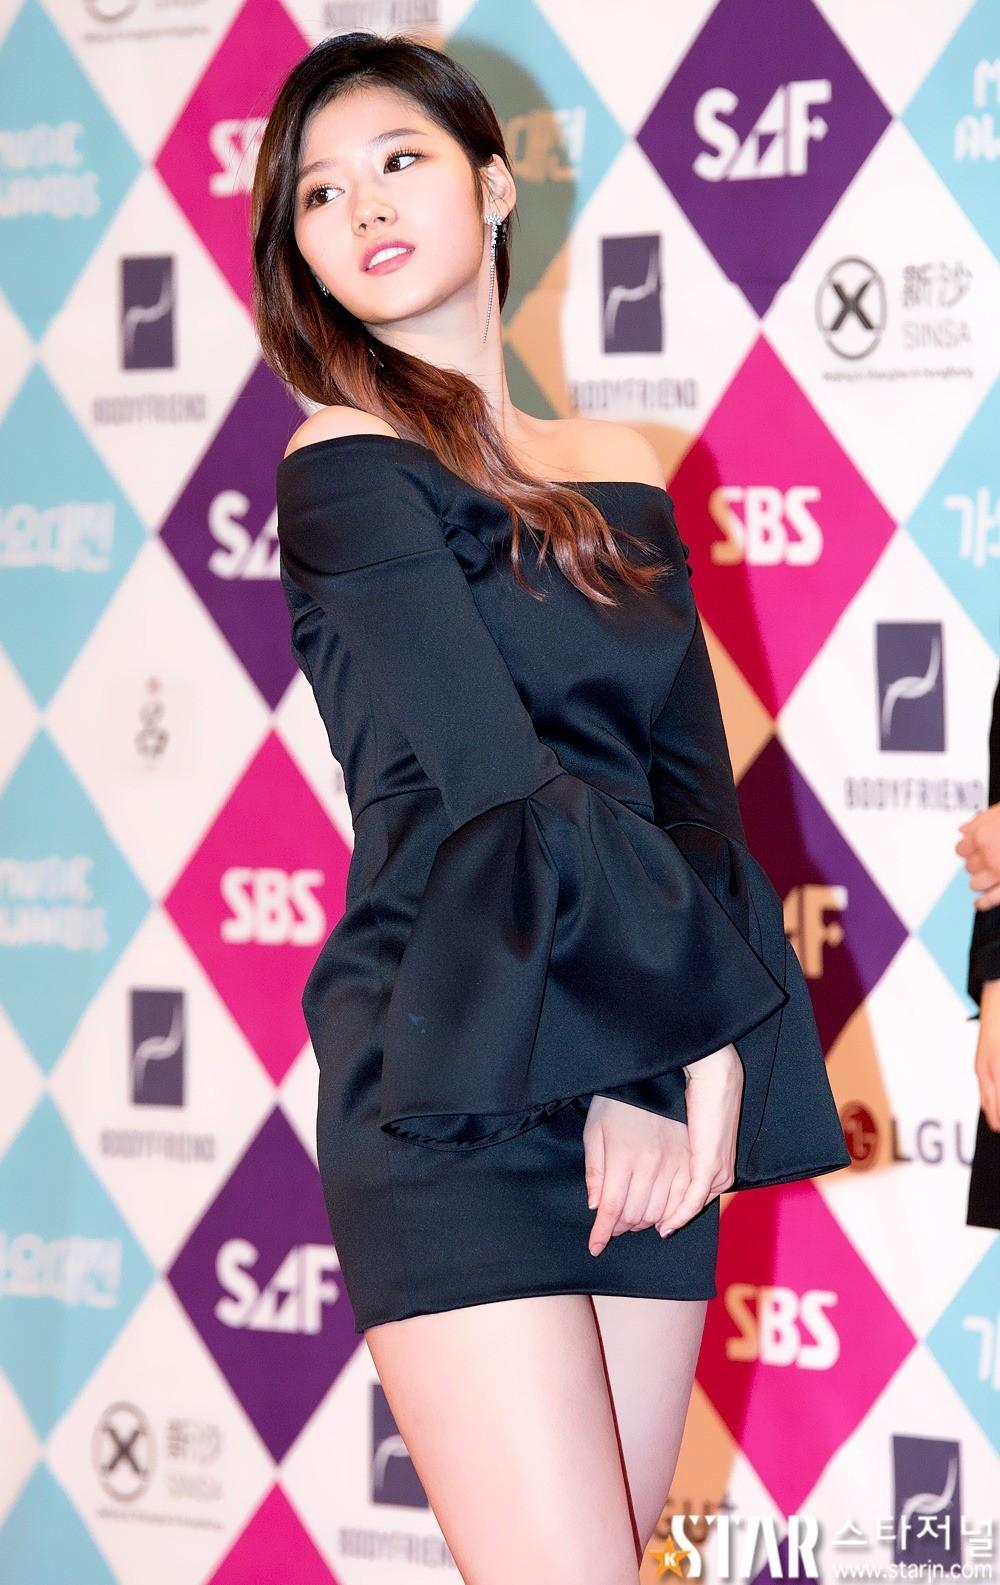 Top 10 Sexiest Outfits Of Twice Sana Koreaboo